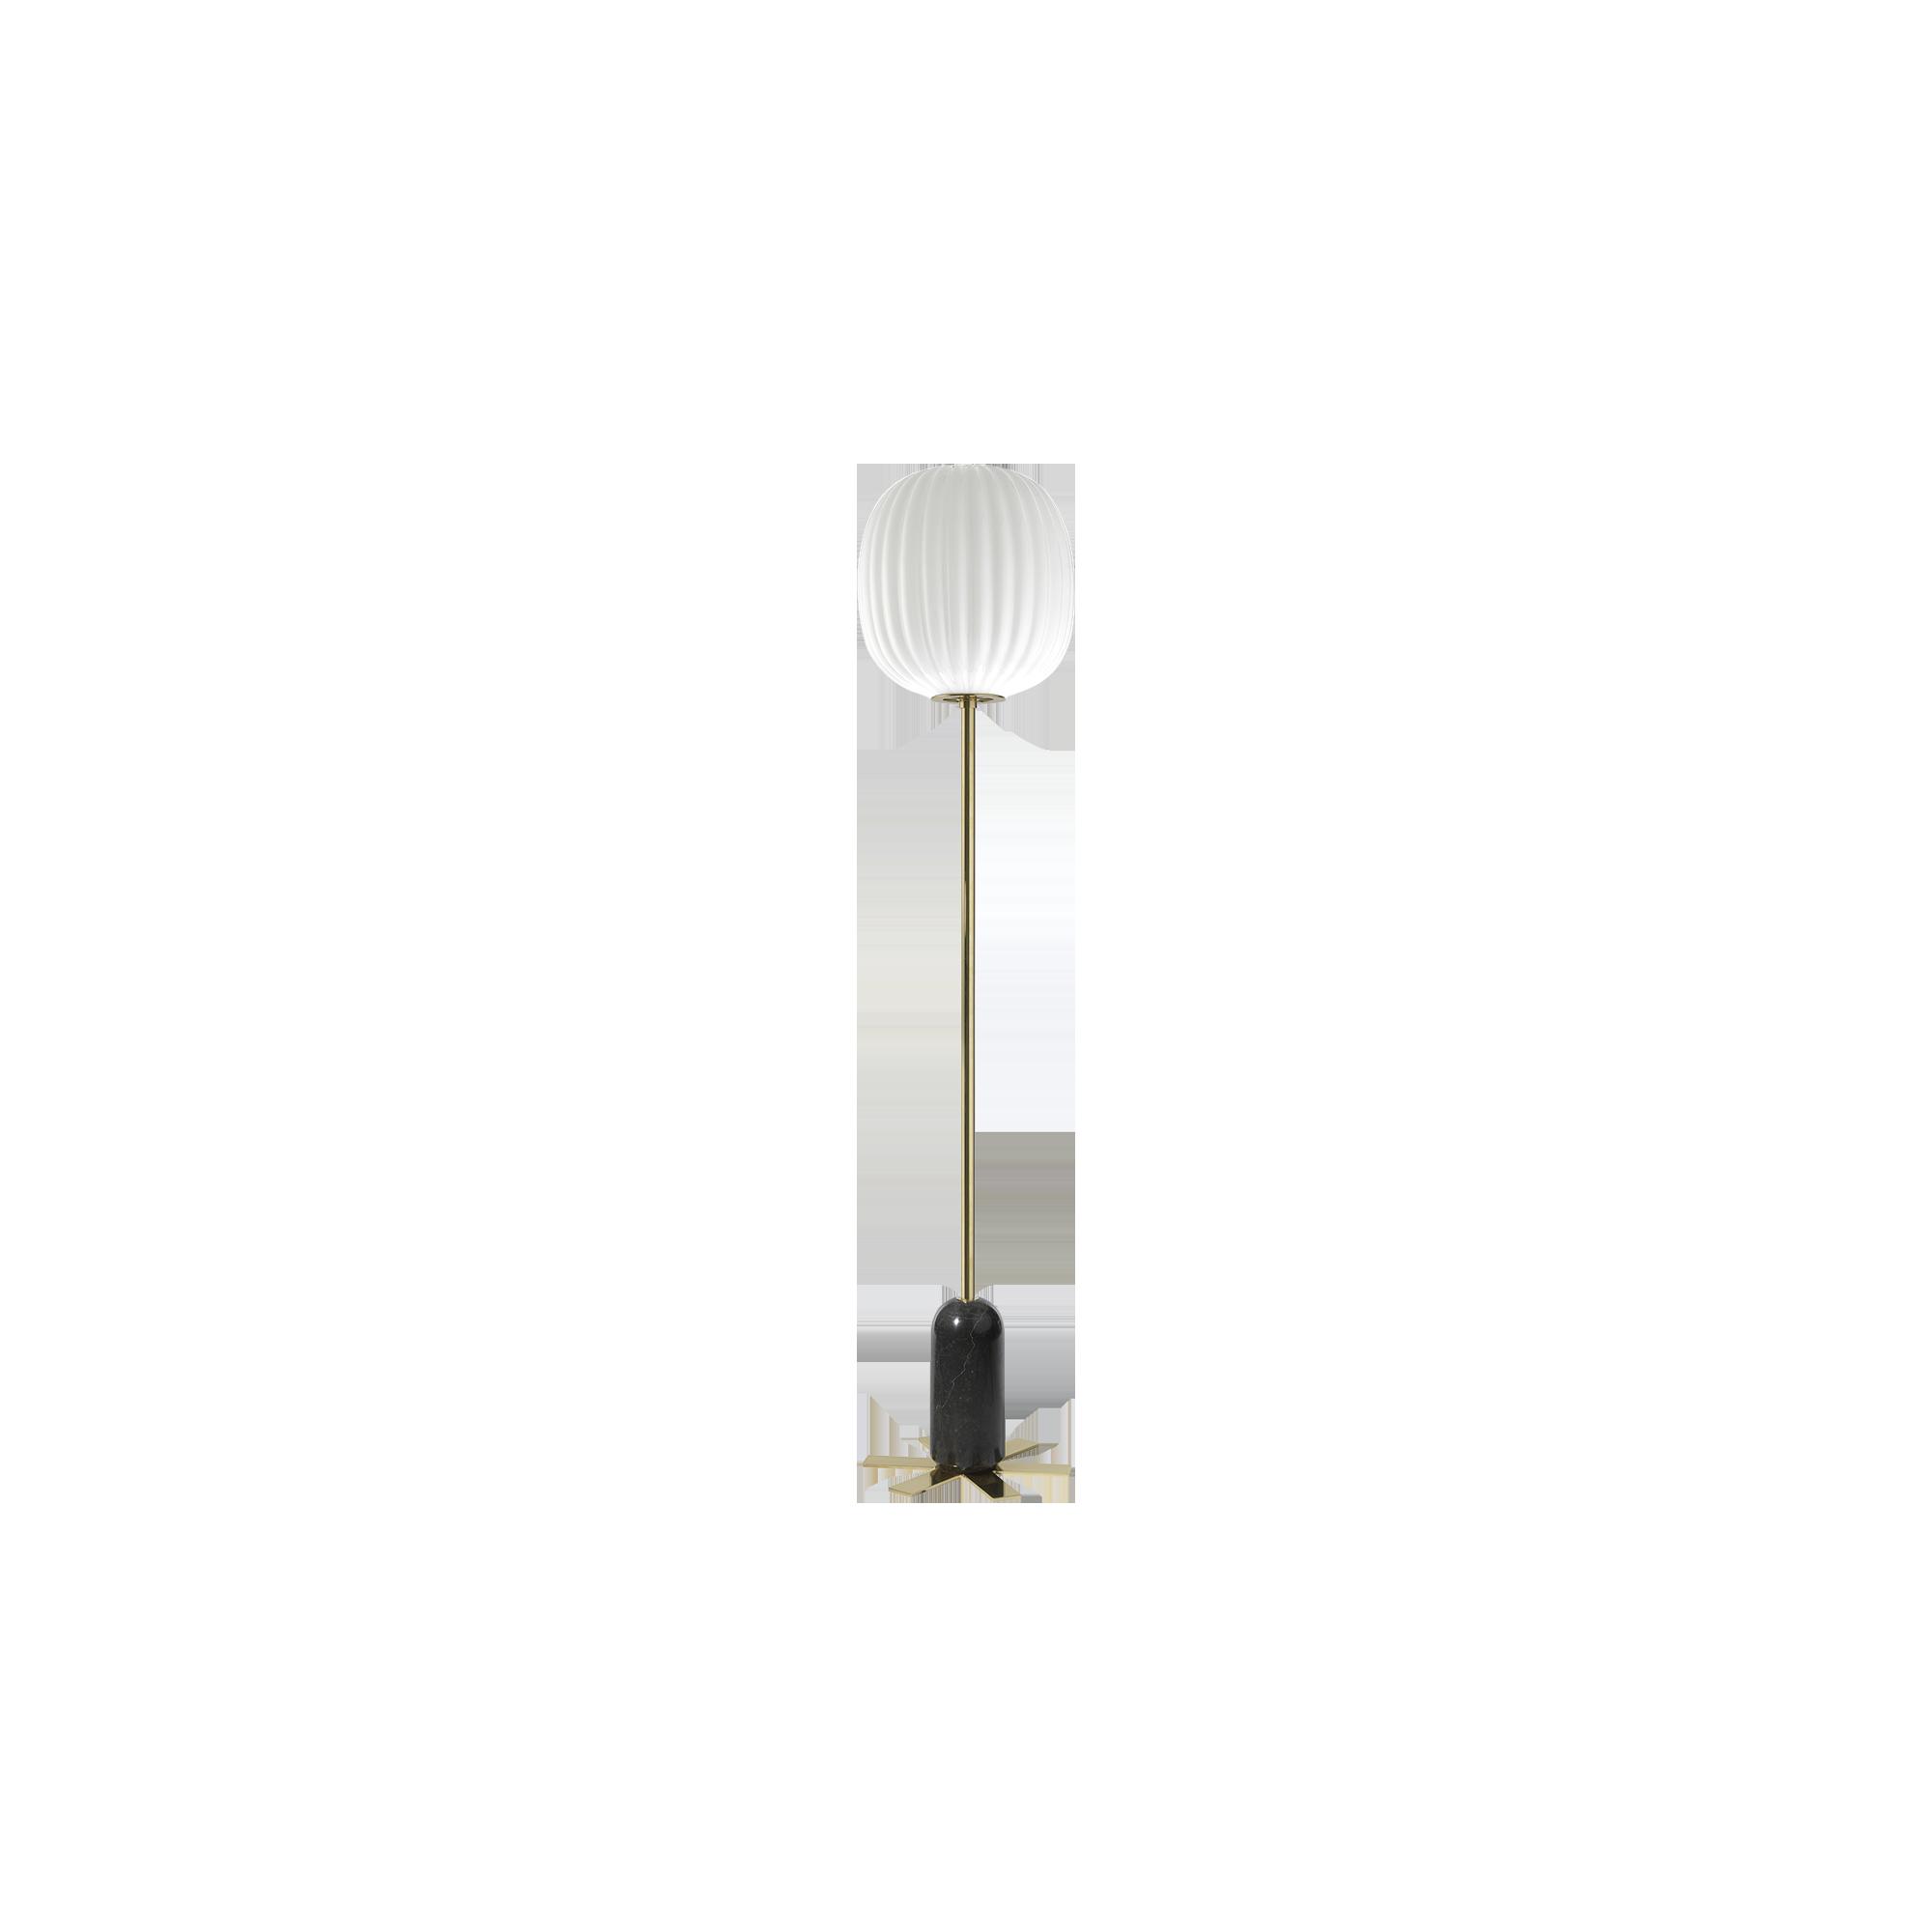 Casanova floorlamp - India Mahdavi